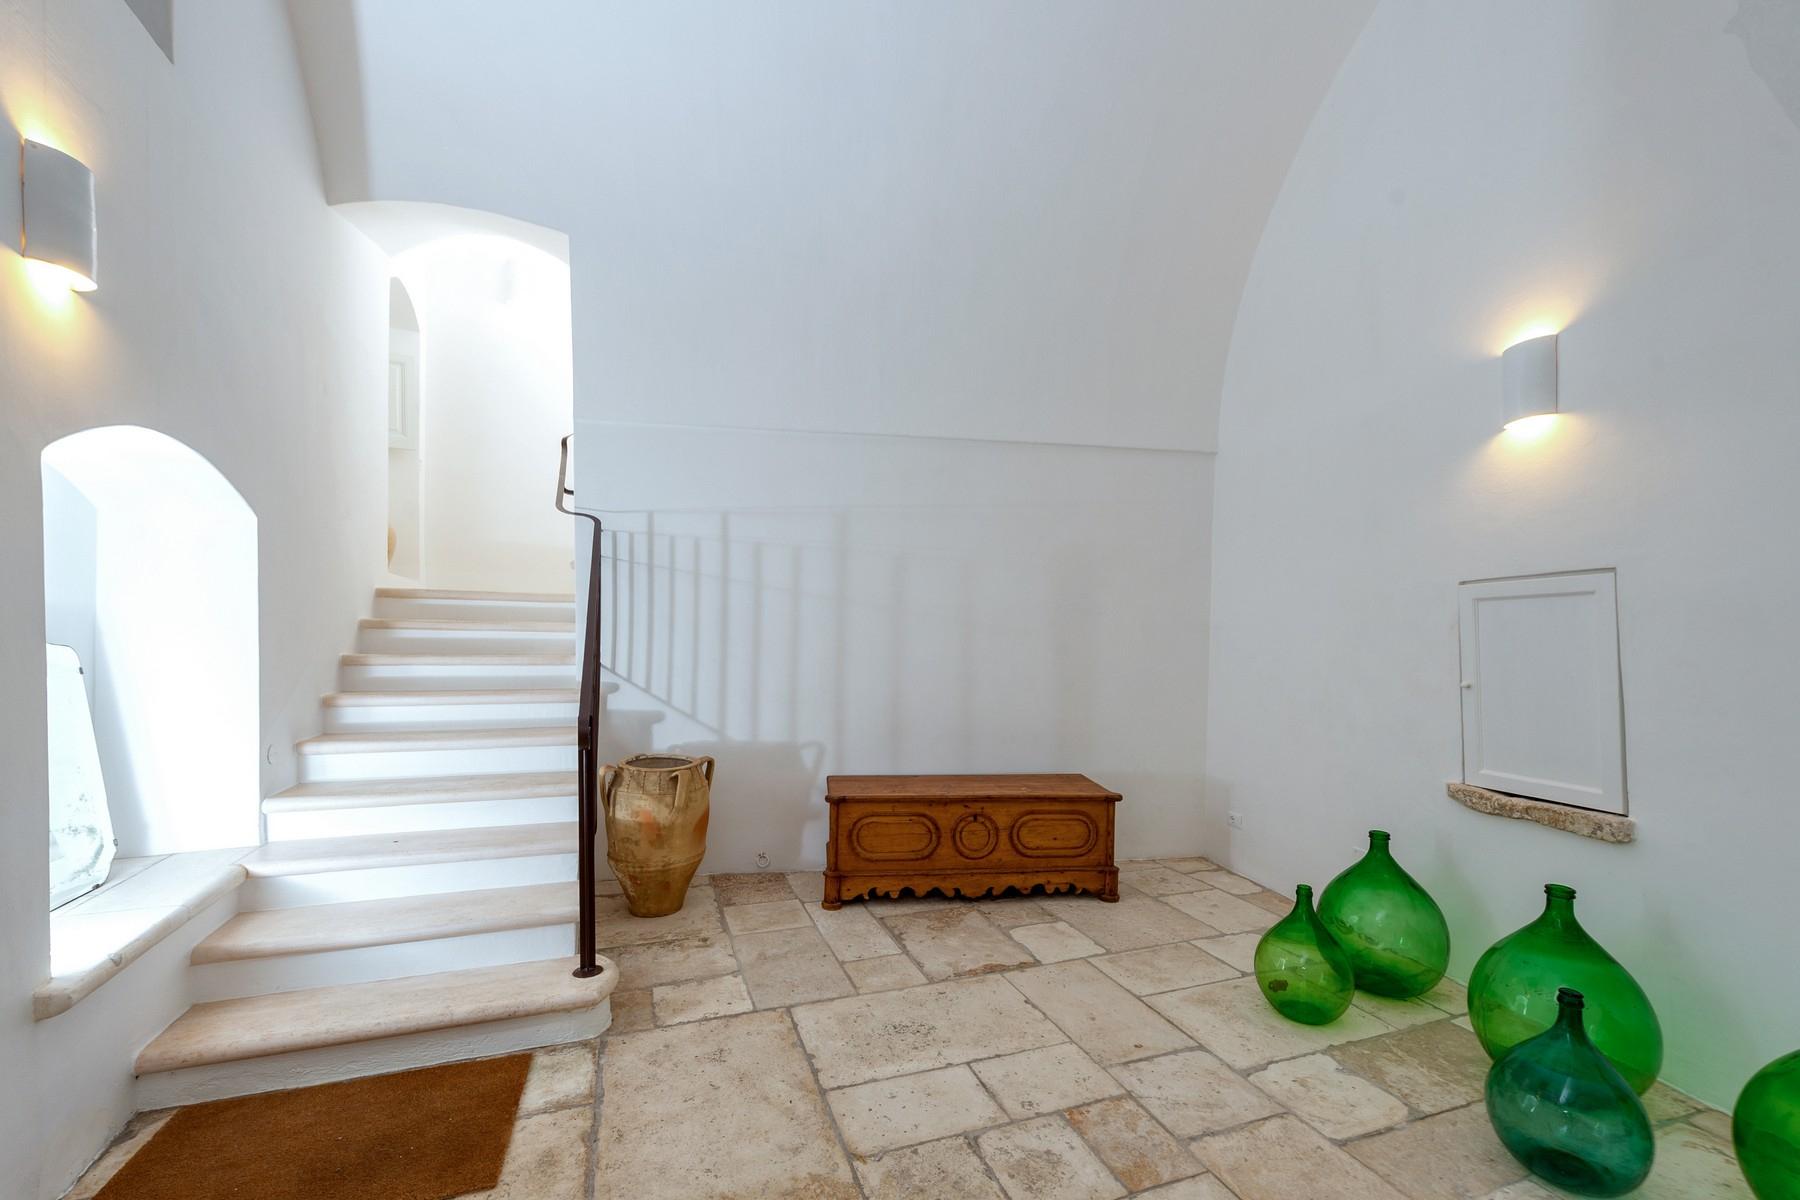 Appartamento in Vendita a Ostuni: 5 locali, 265 mq - Foto 11